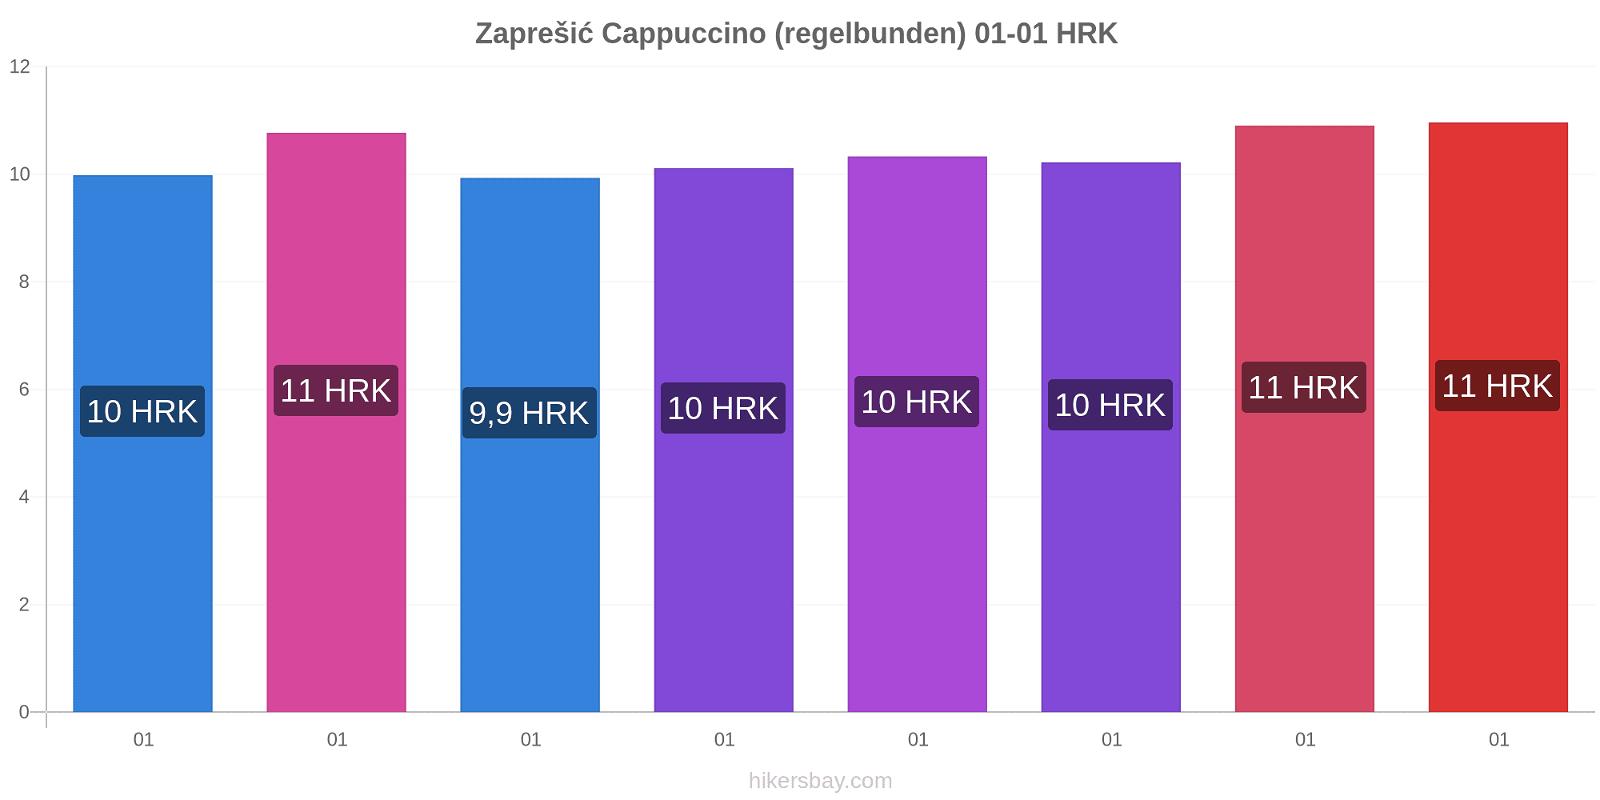 Zaprešić prisförändringar Cappuccino (regelbunden) hikersbay.com